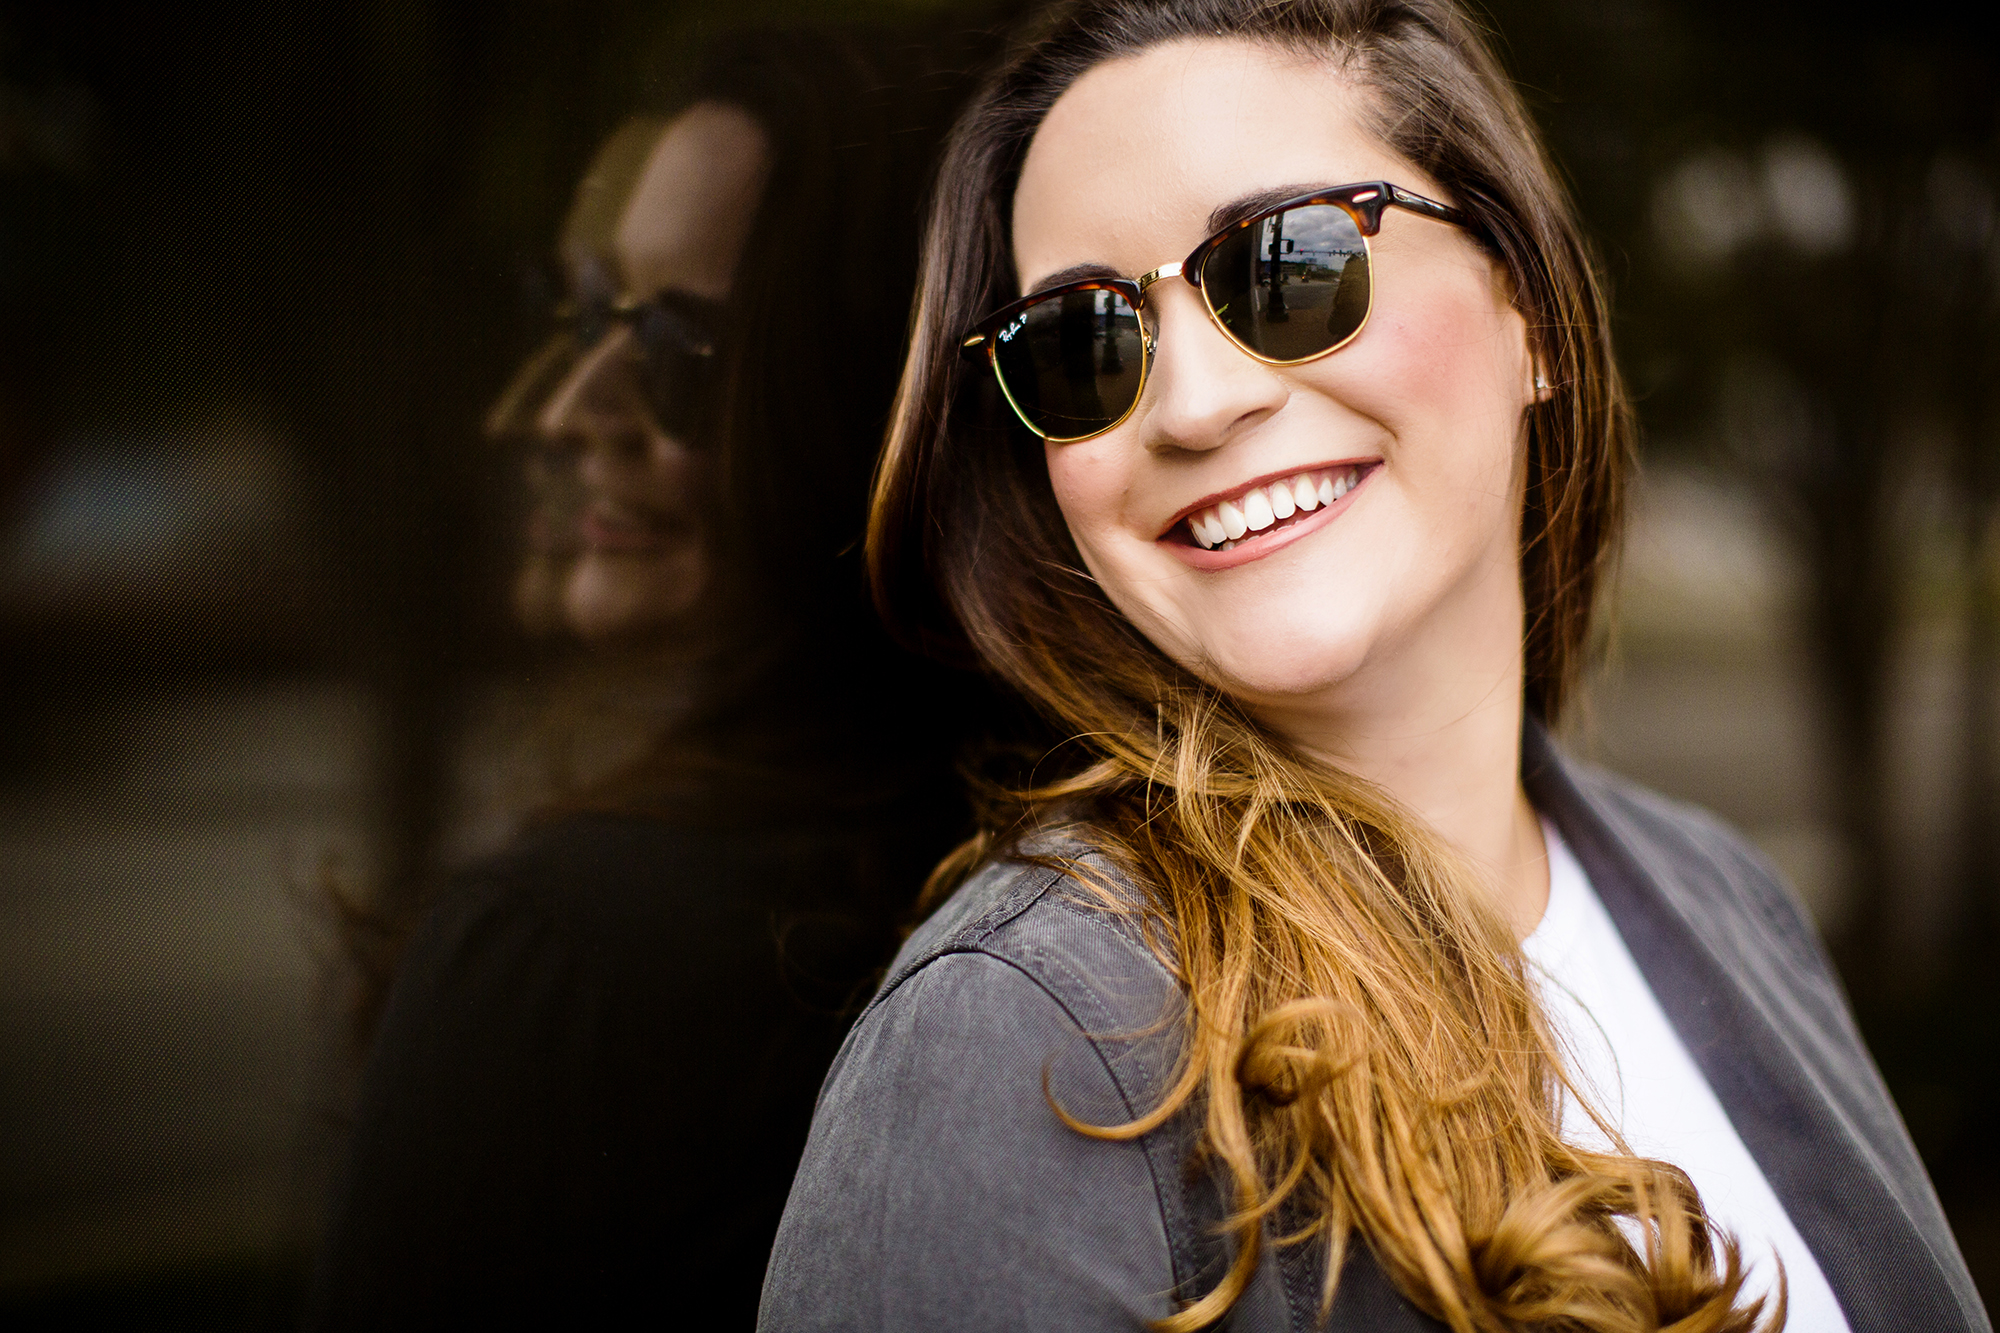 Seriously_Sabrina_Photography_Ashland_Kentucky_Fashion_Blogger_Portraits_LaurenFannin5.jpg